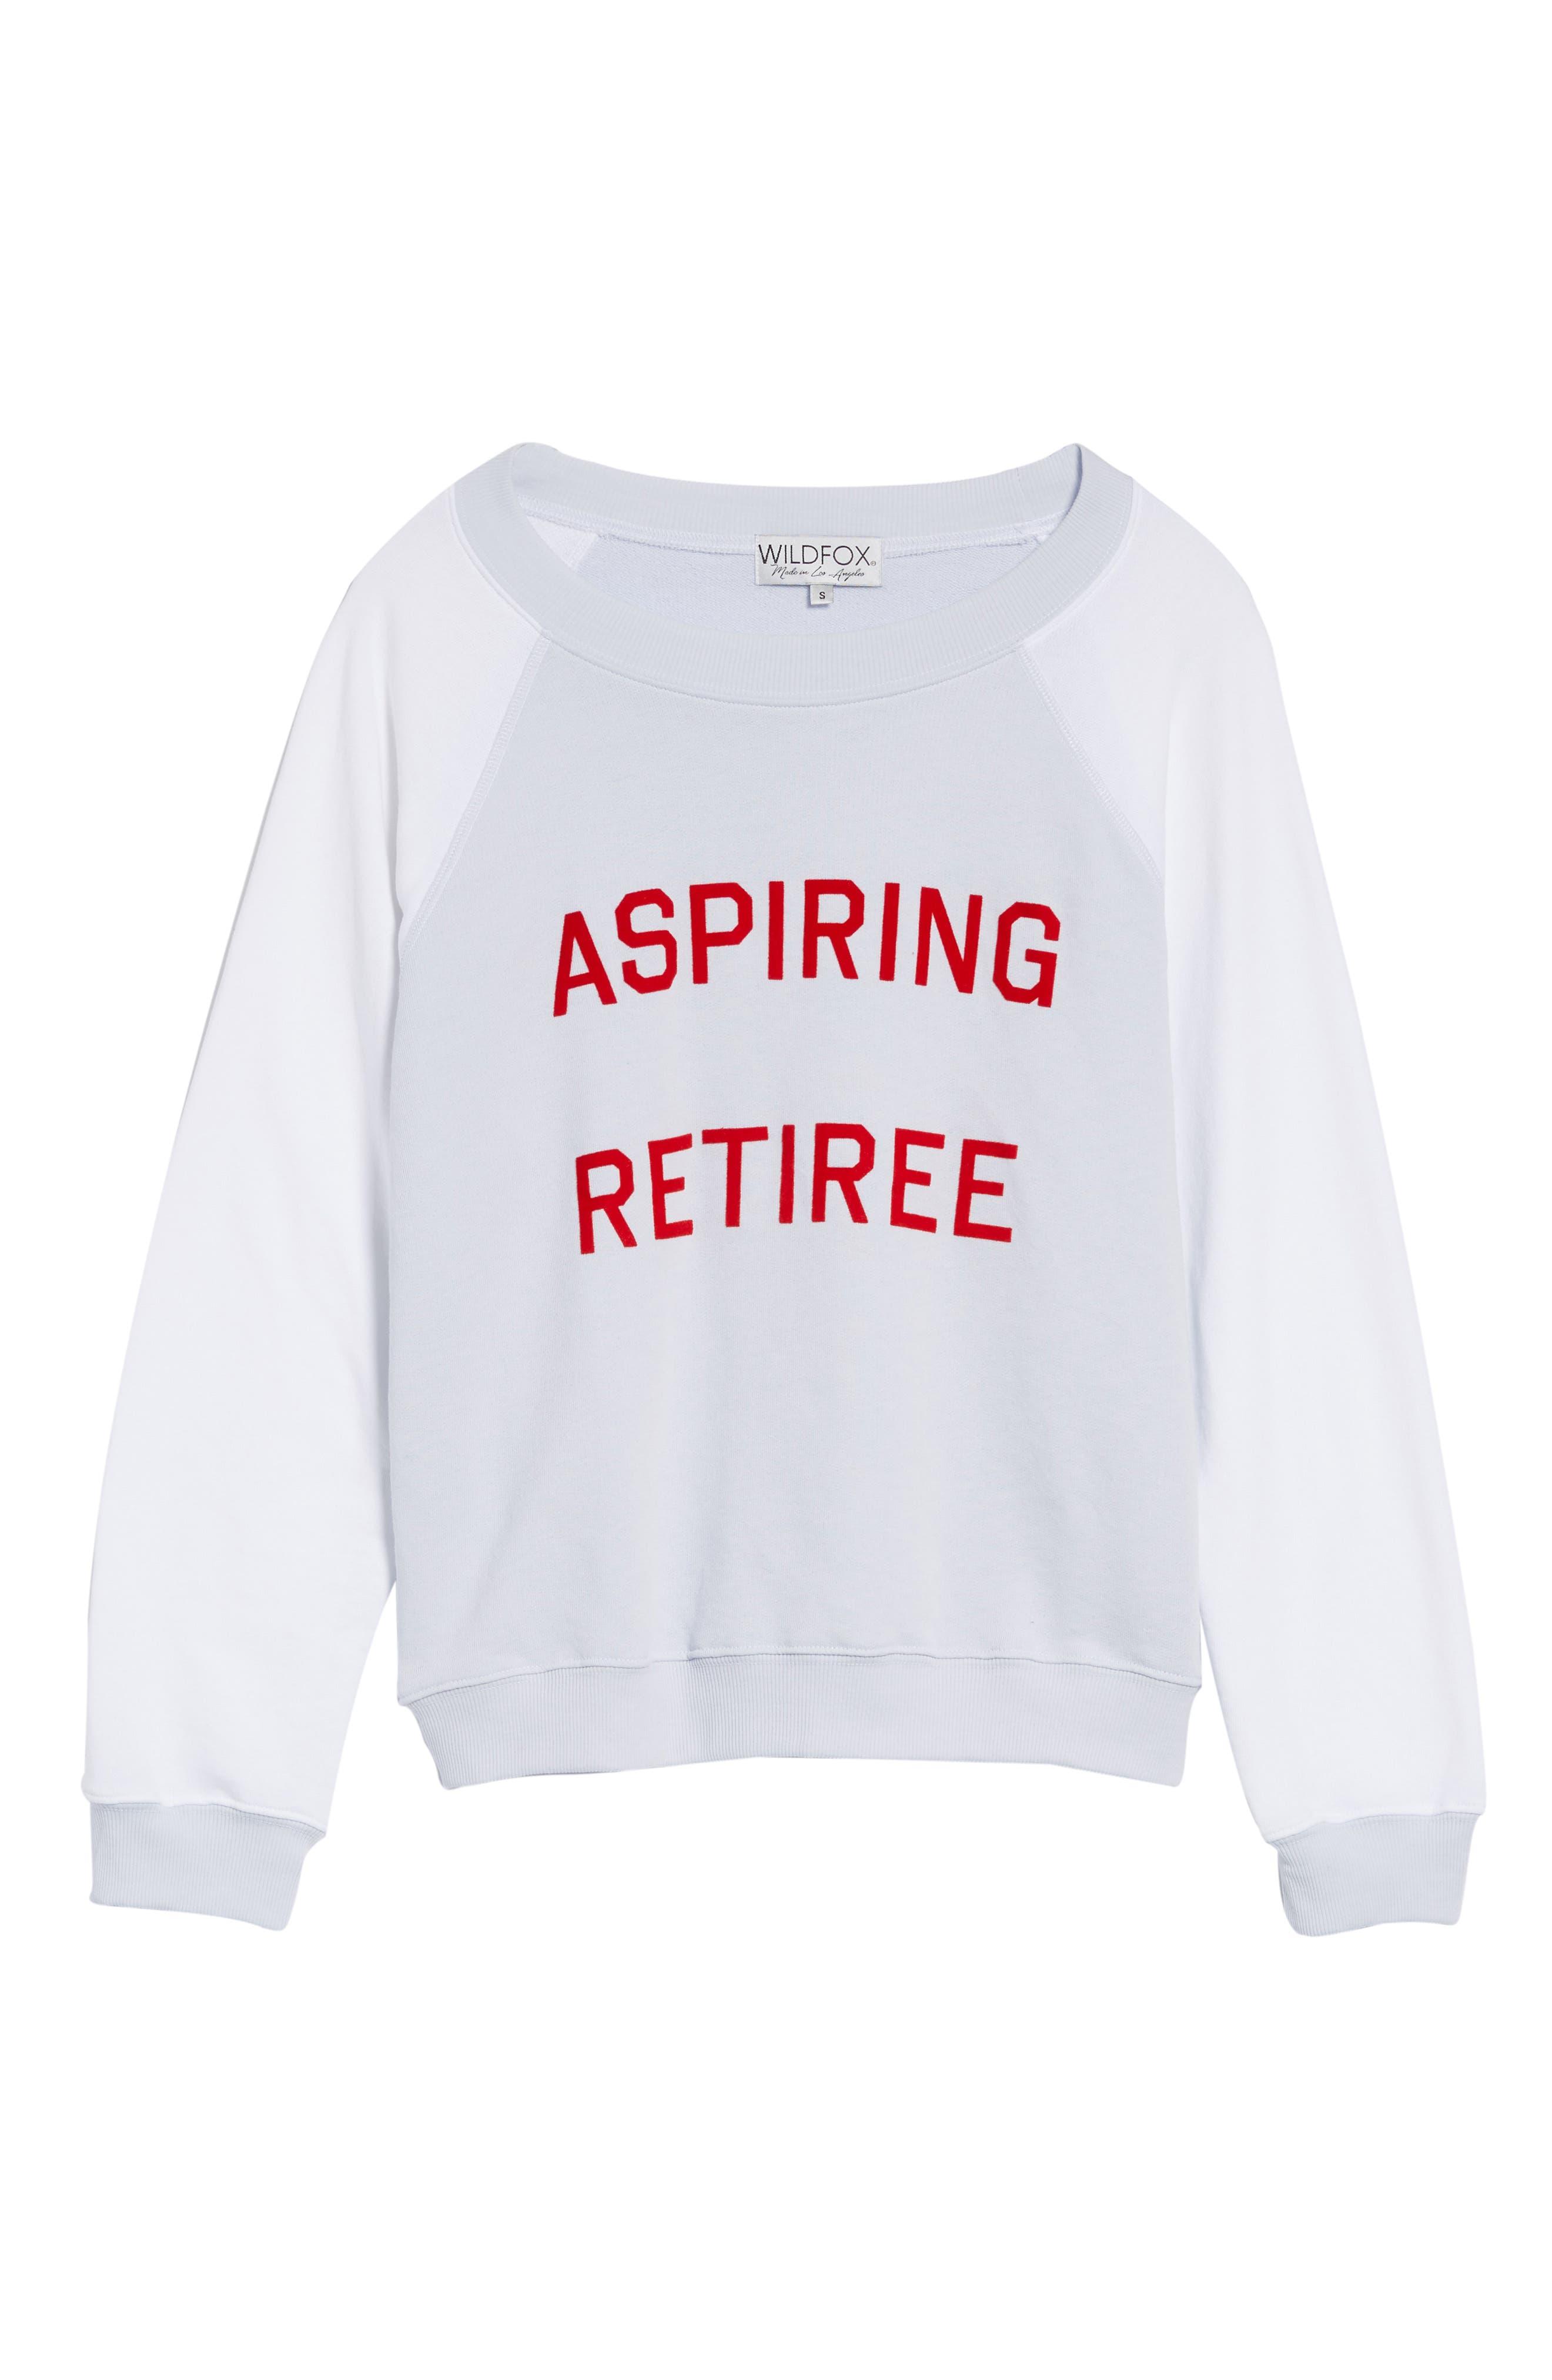 Aspiring Retiree Sweatshirt,                             Alternate thumbnail 6, color,